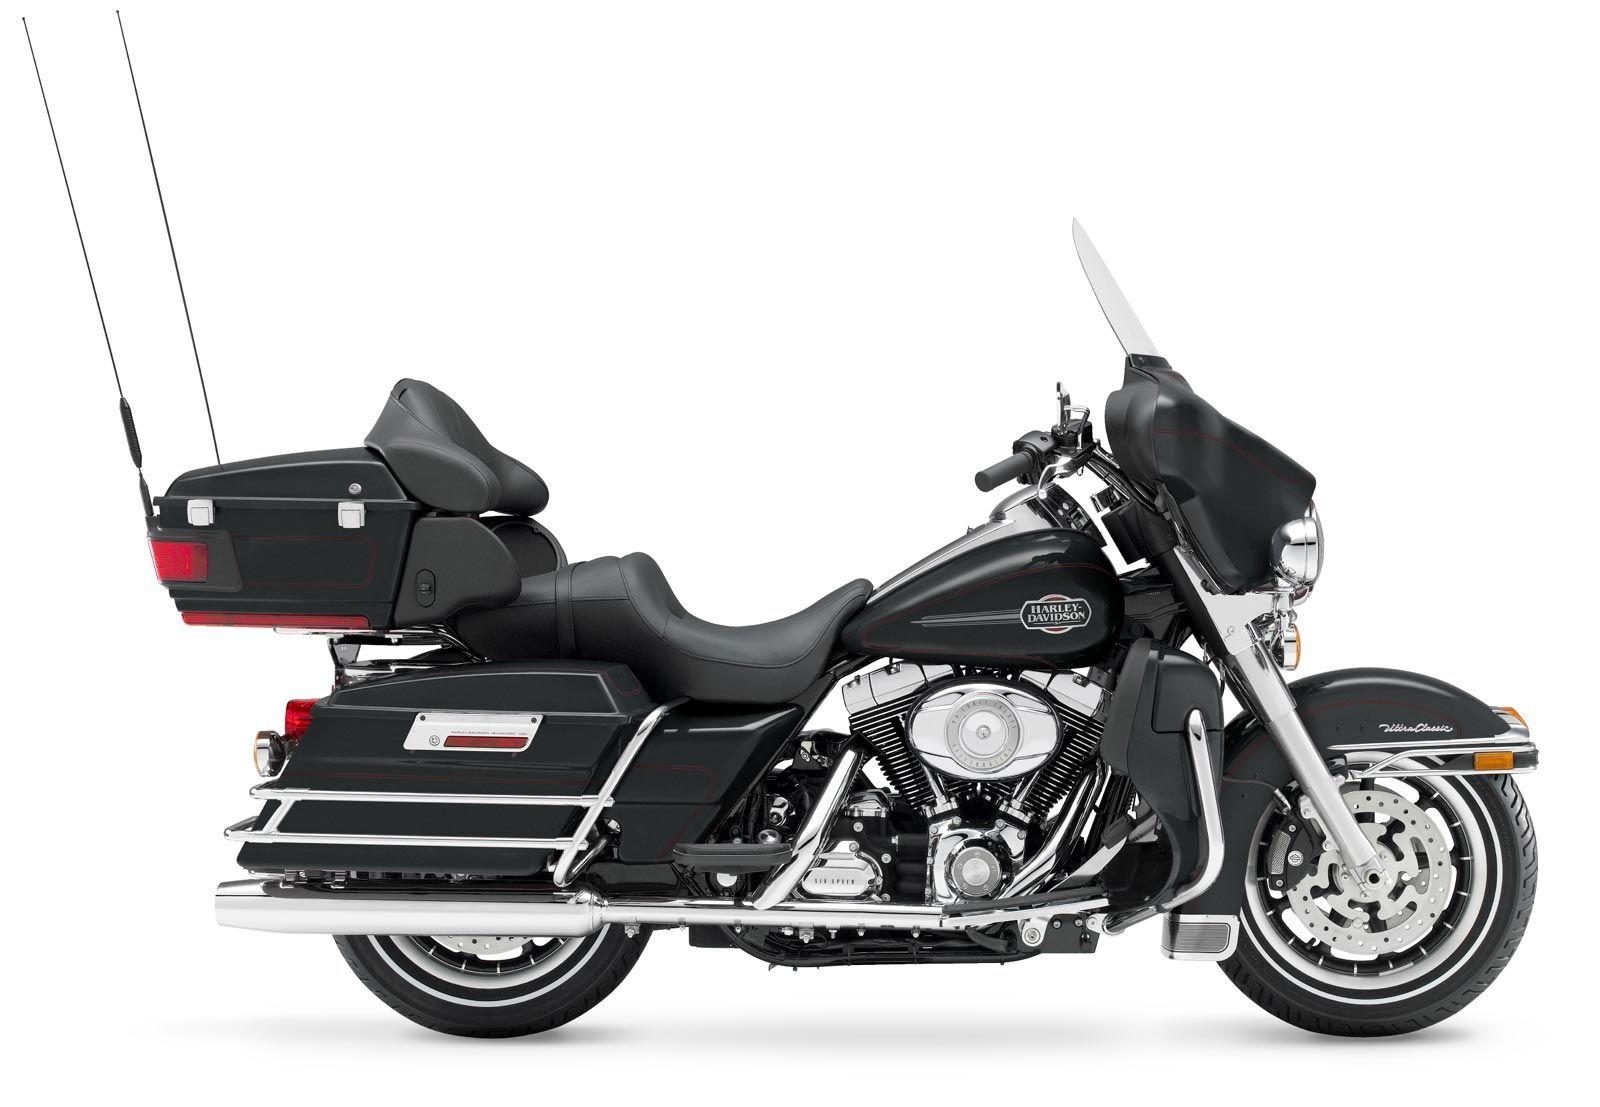 1989 Harley Davidson Electra Glide Police Special